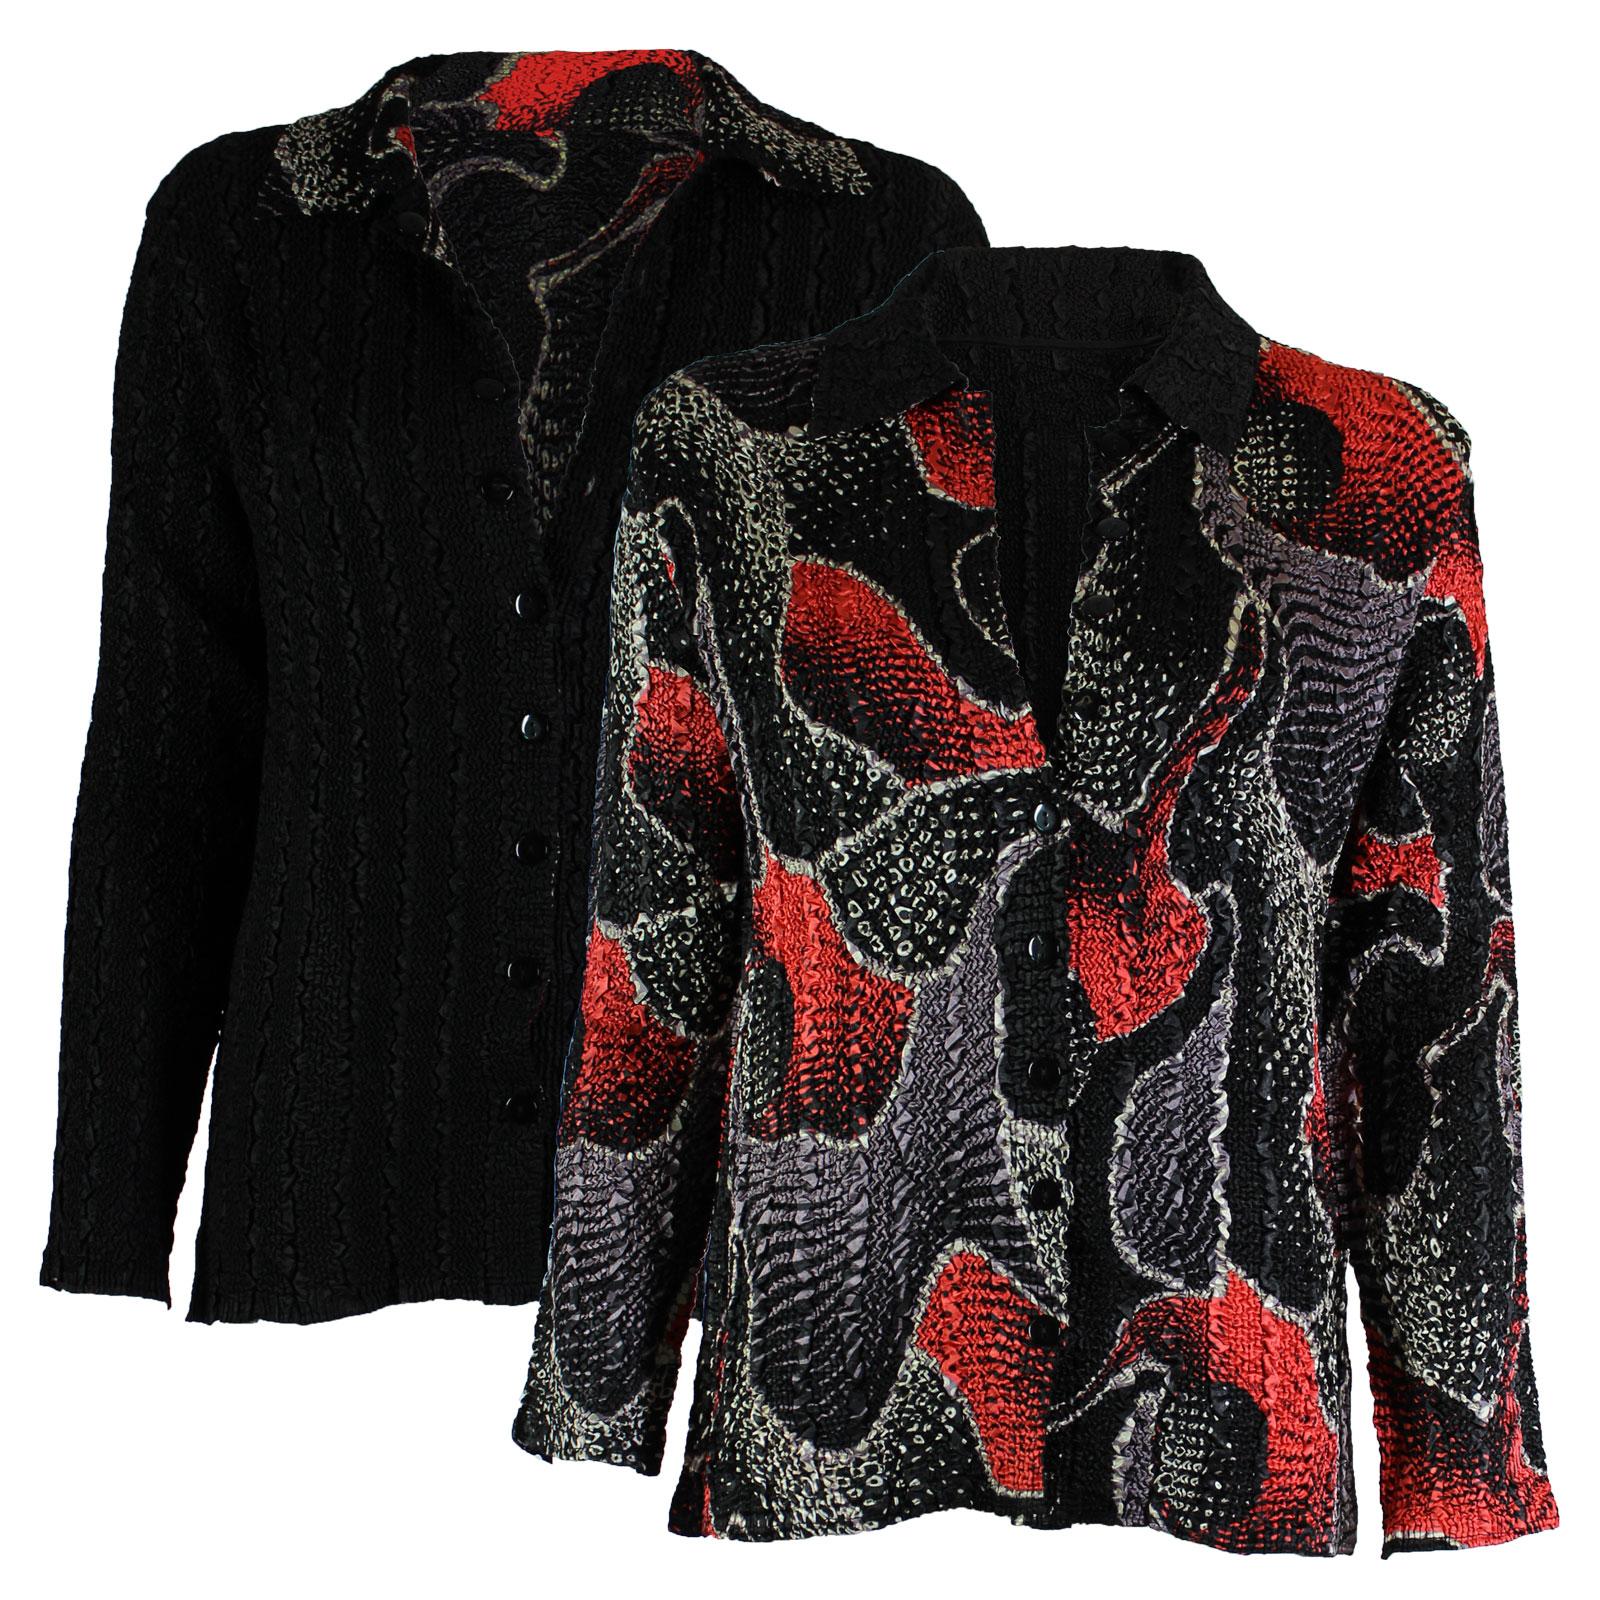 Wholesale Magic Crush - Reversible Jackets #14009 Black, Red and Grey Print - 1X-2X